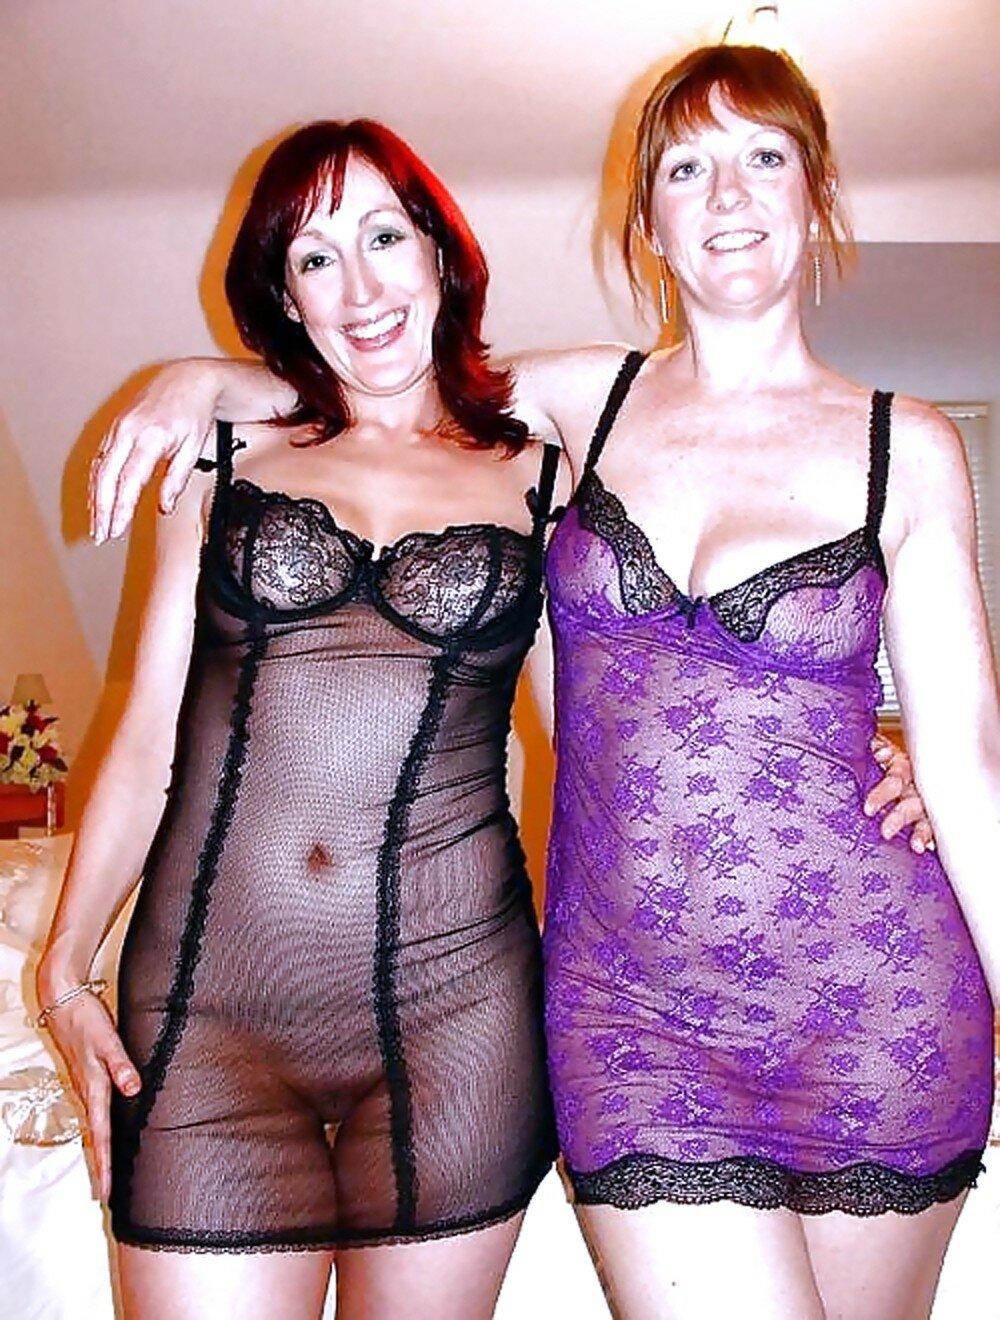 Жены секс две зрелых женщины